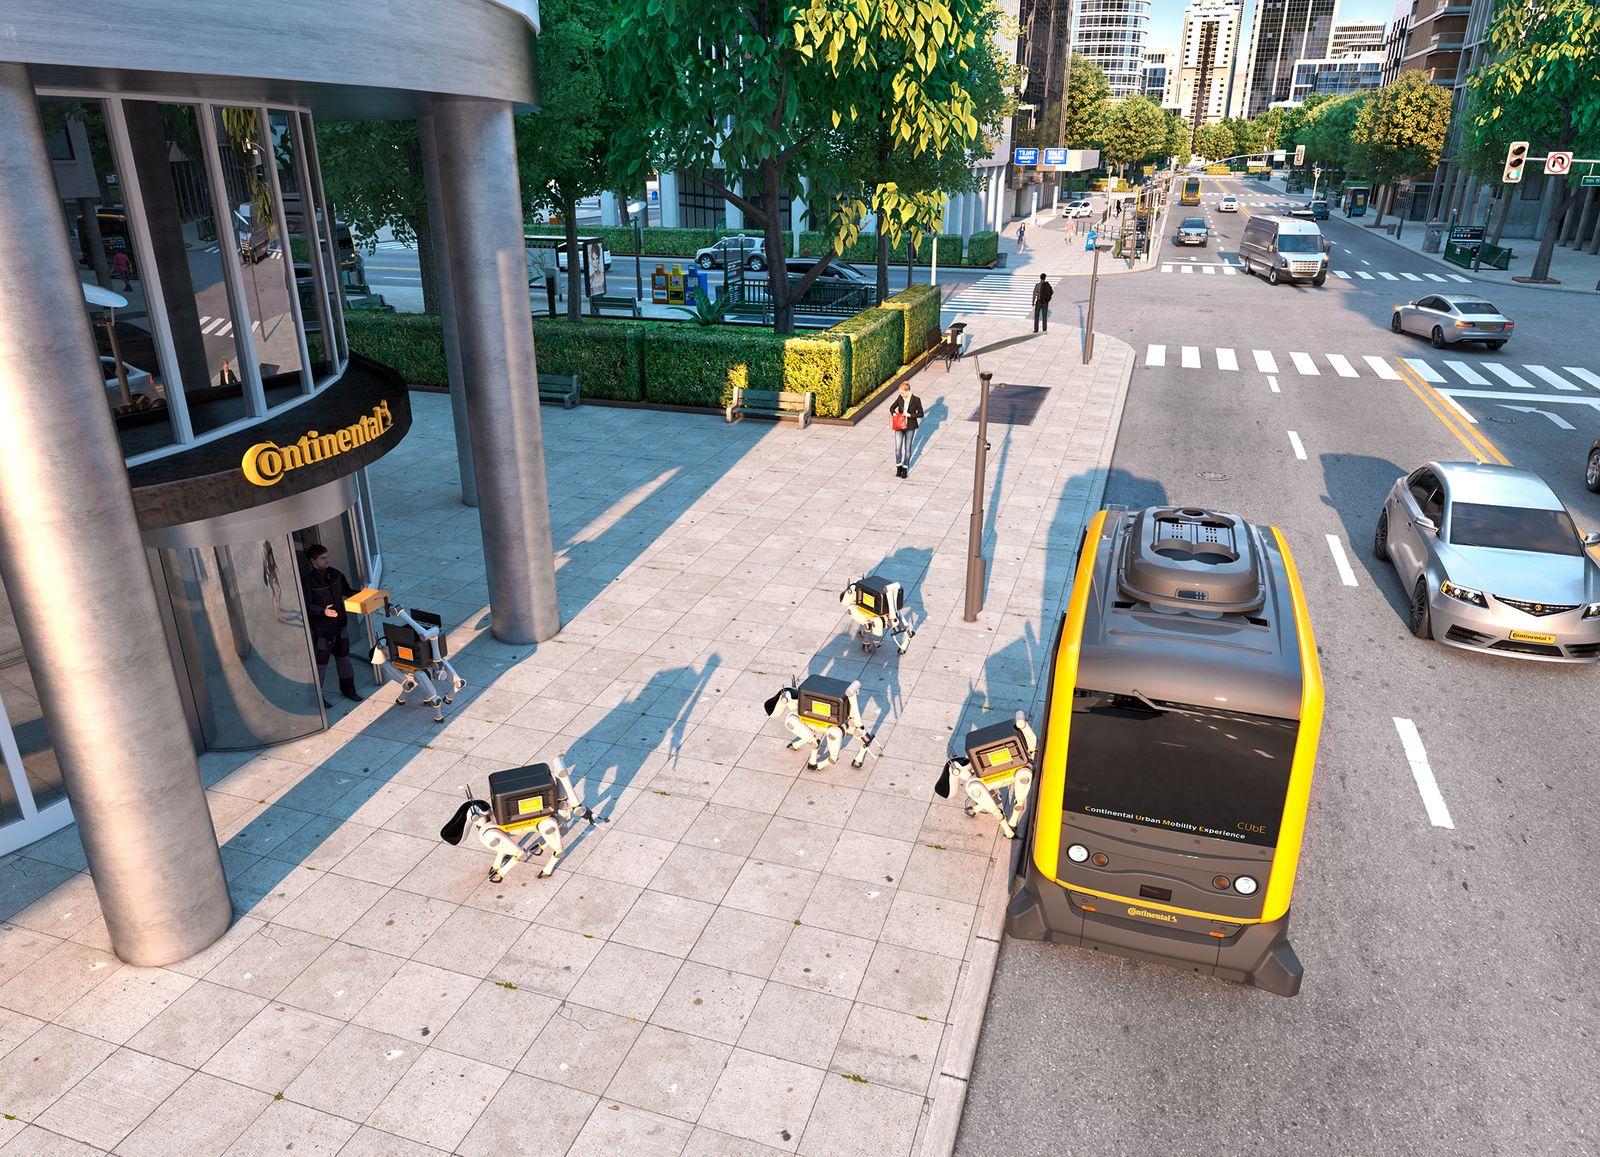 Continental AG / Fahrerloses Fahrzeug mit Lieferrobotern